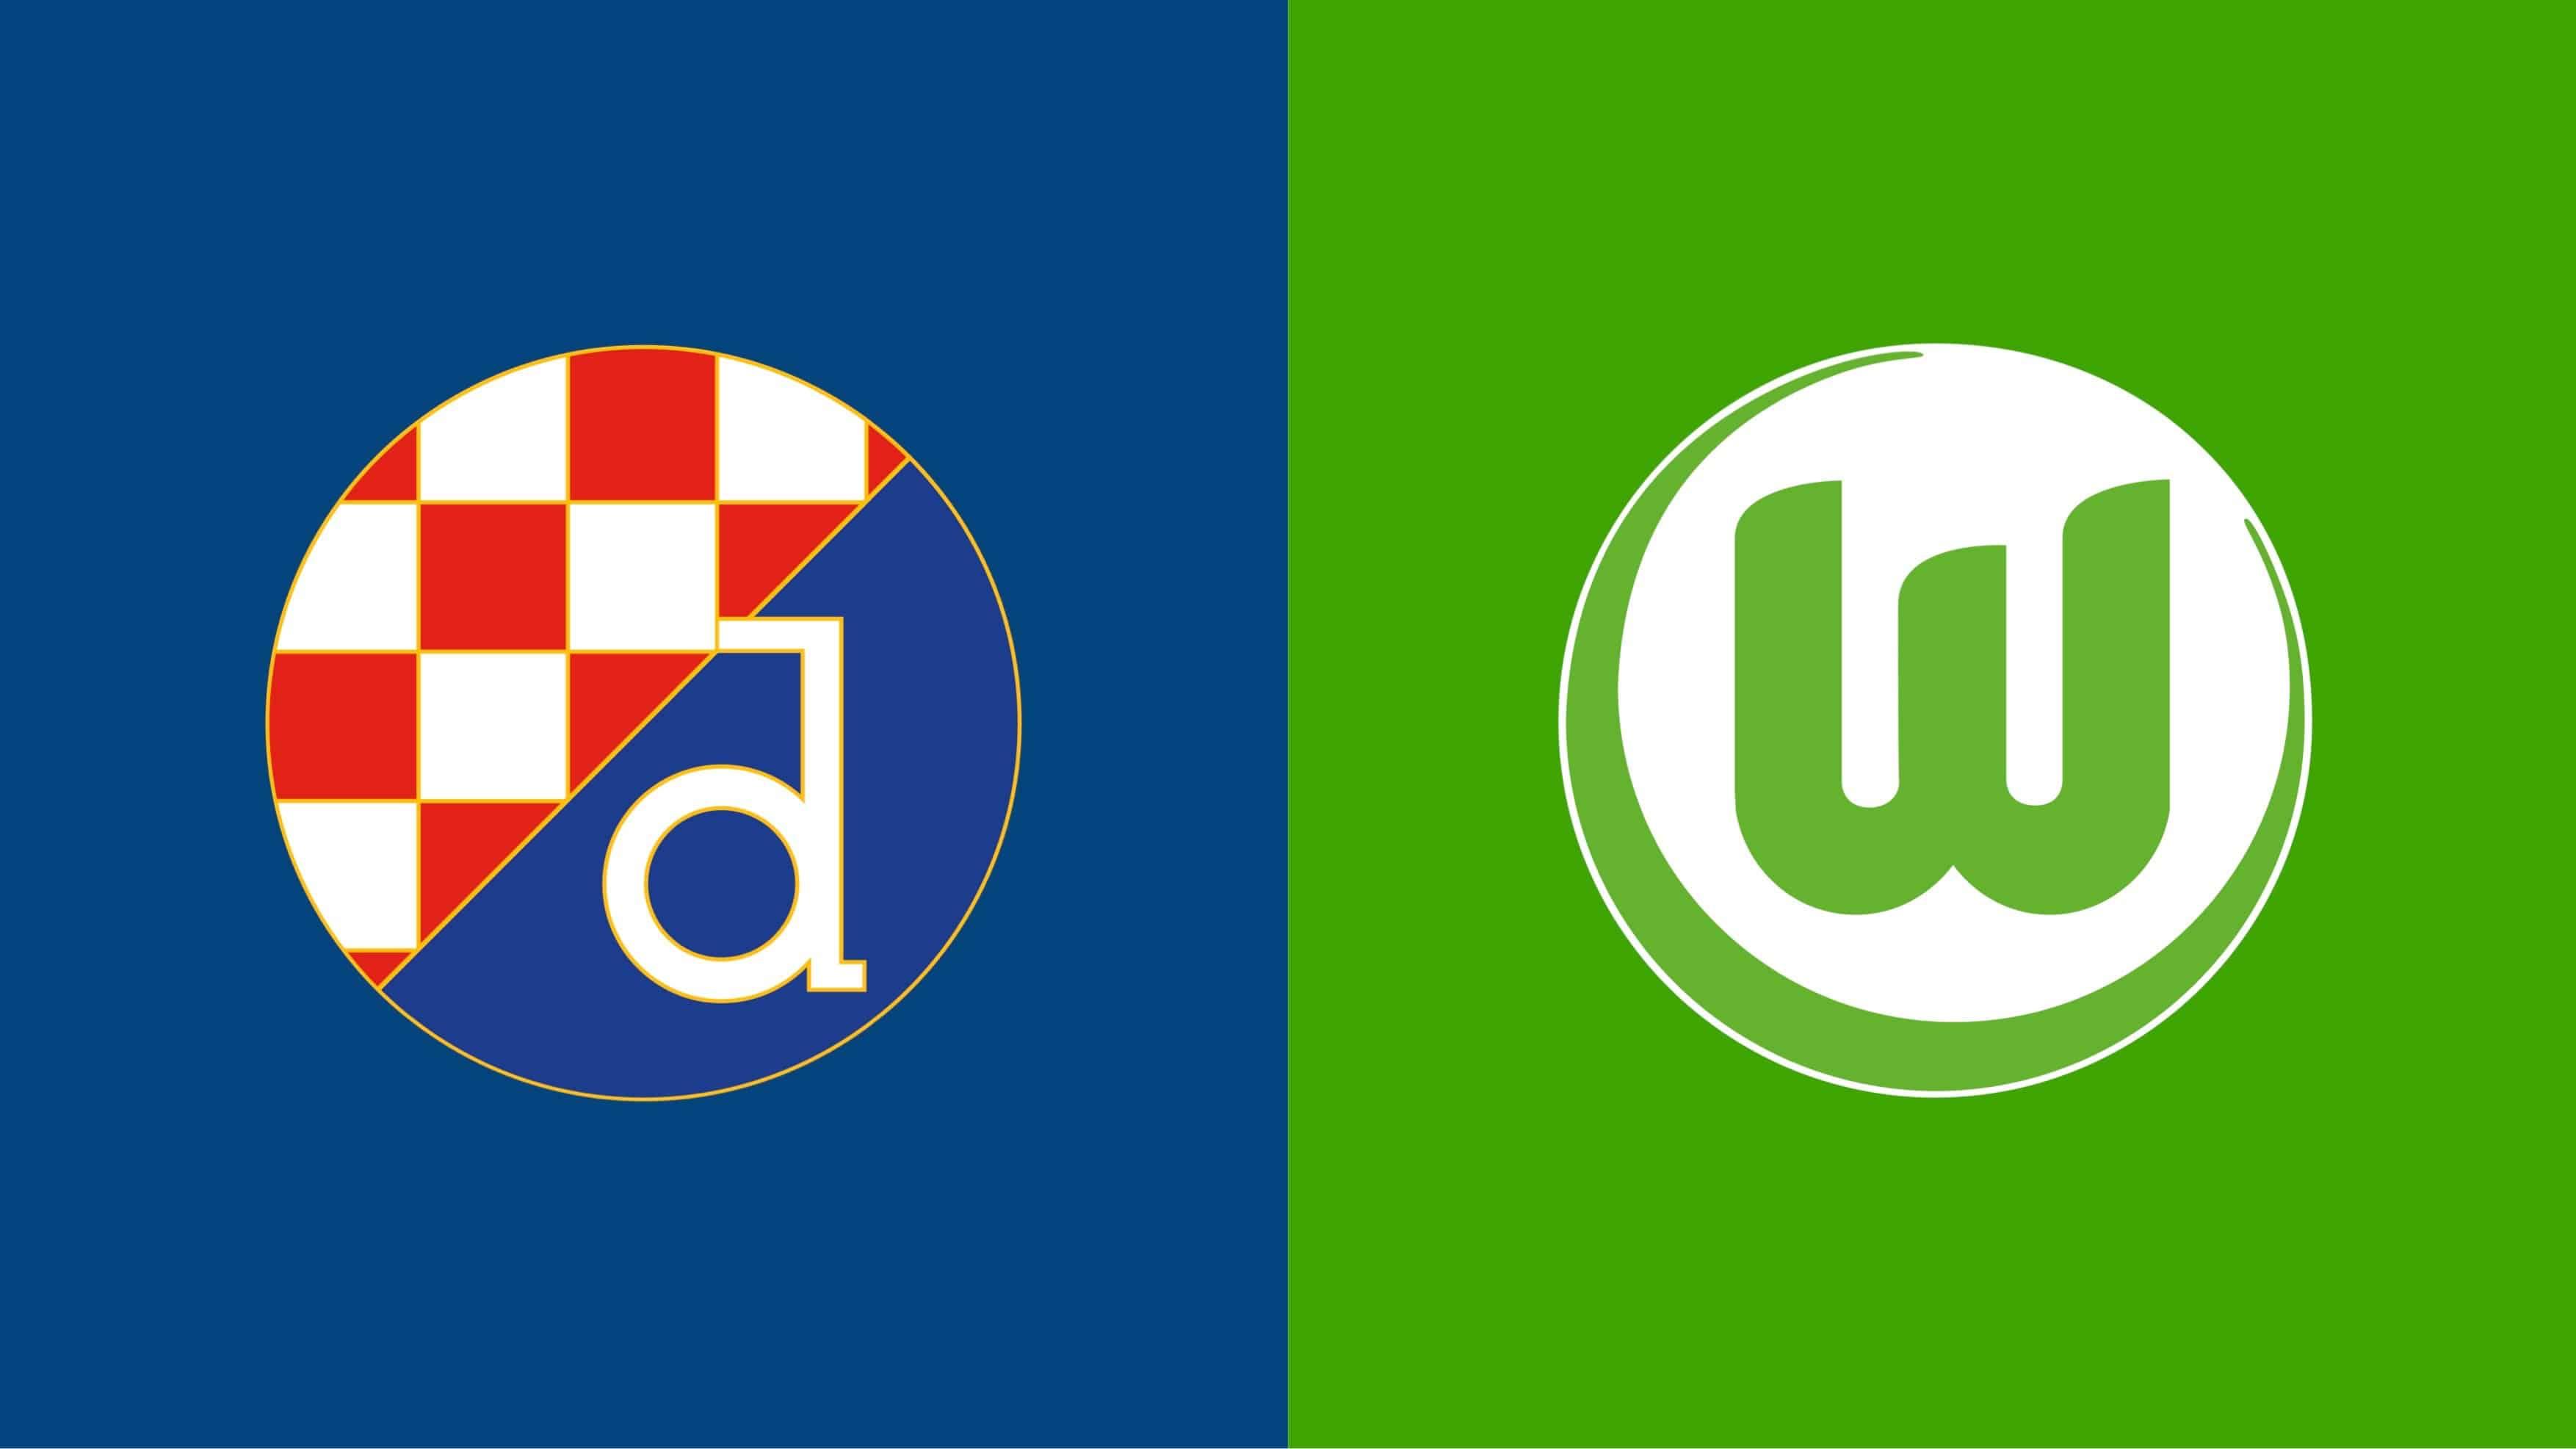 GNK Dinamo Zagreb - Wikipedia  |Dinamo Zagreb